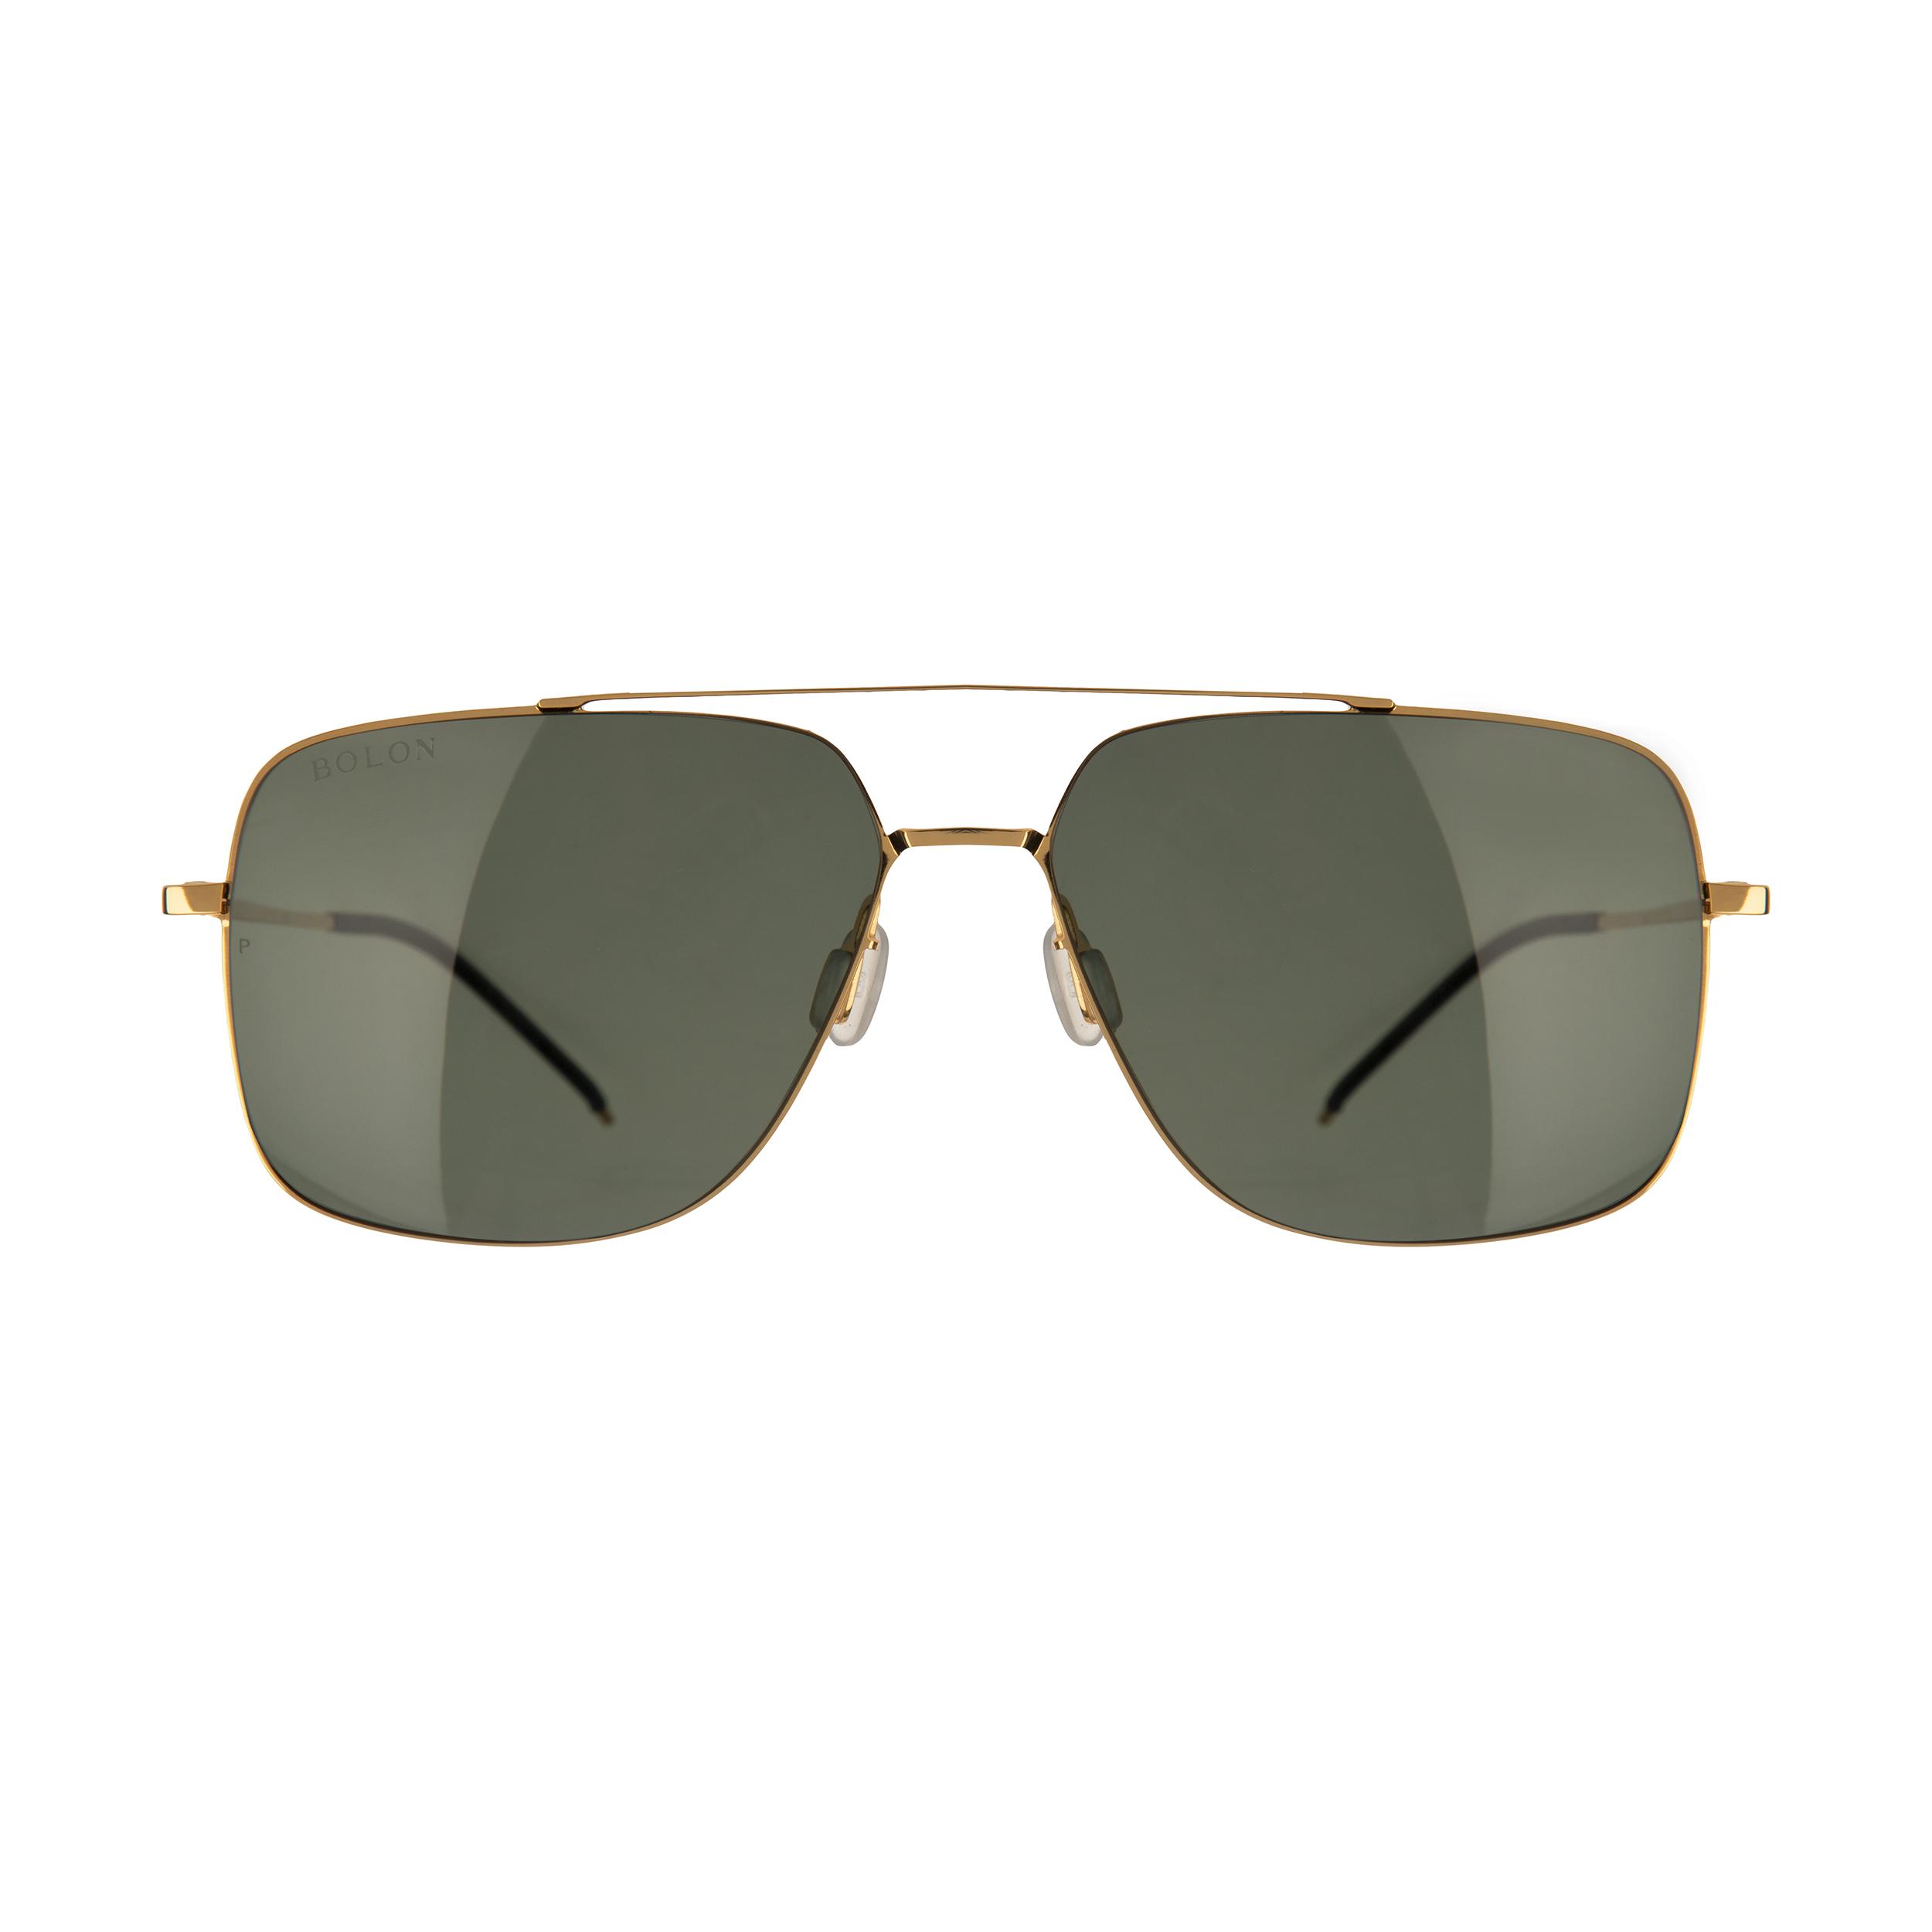 عینک آفتابی مردانه بولون مدل BL8012C60